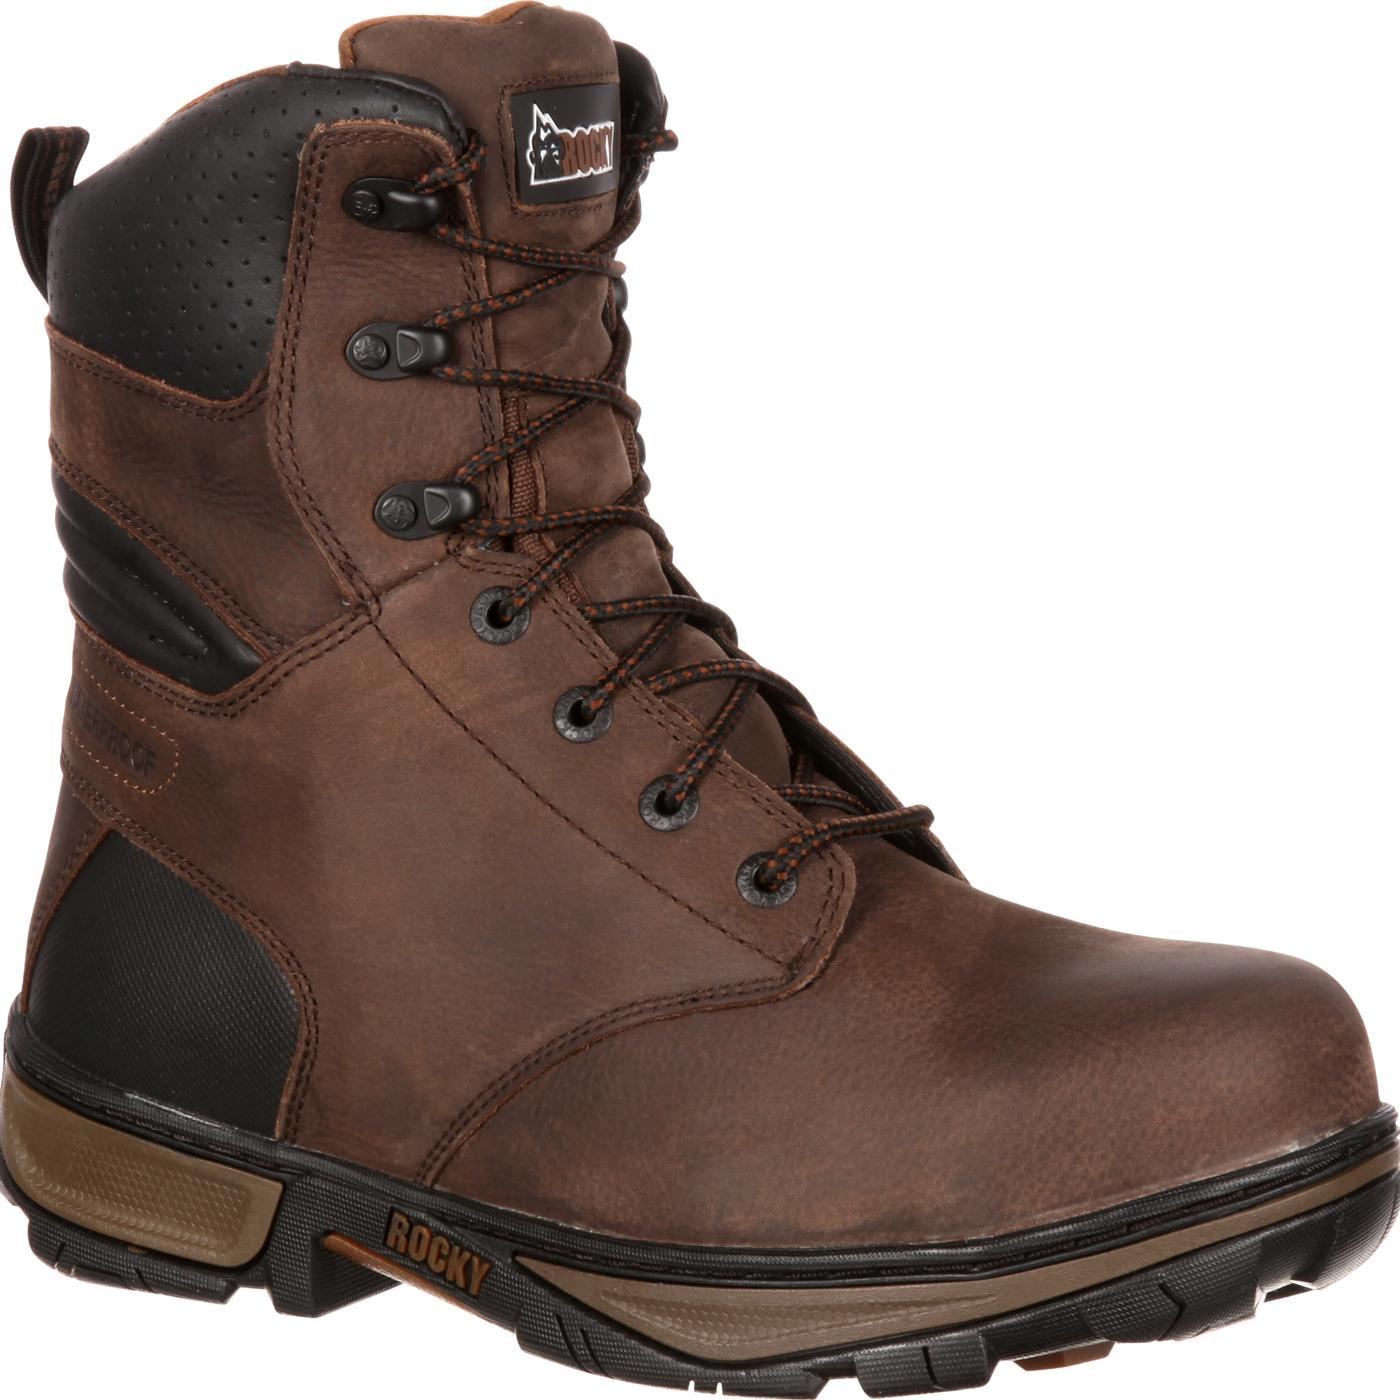 s brown steel toe waterproof work boots rocky forge